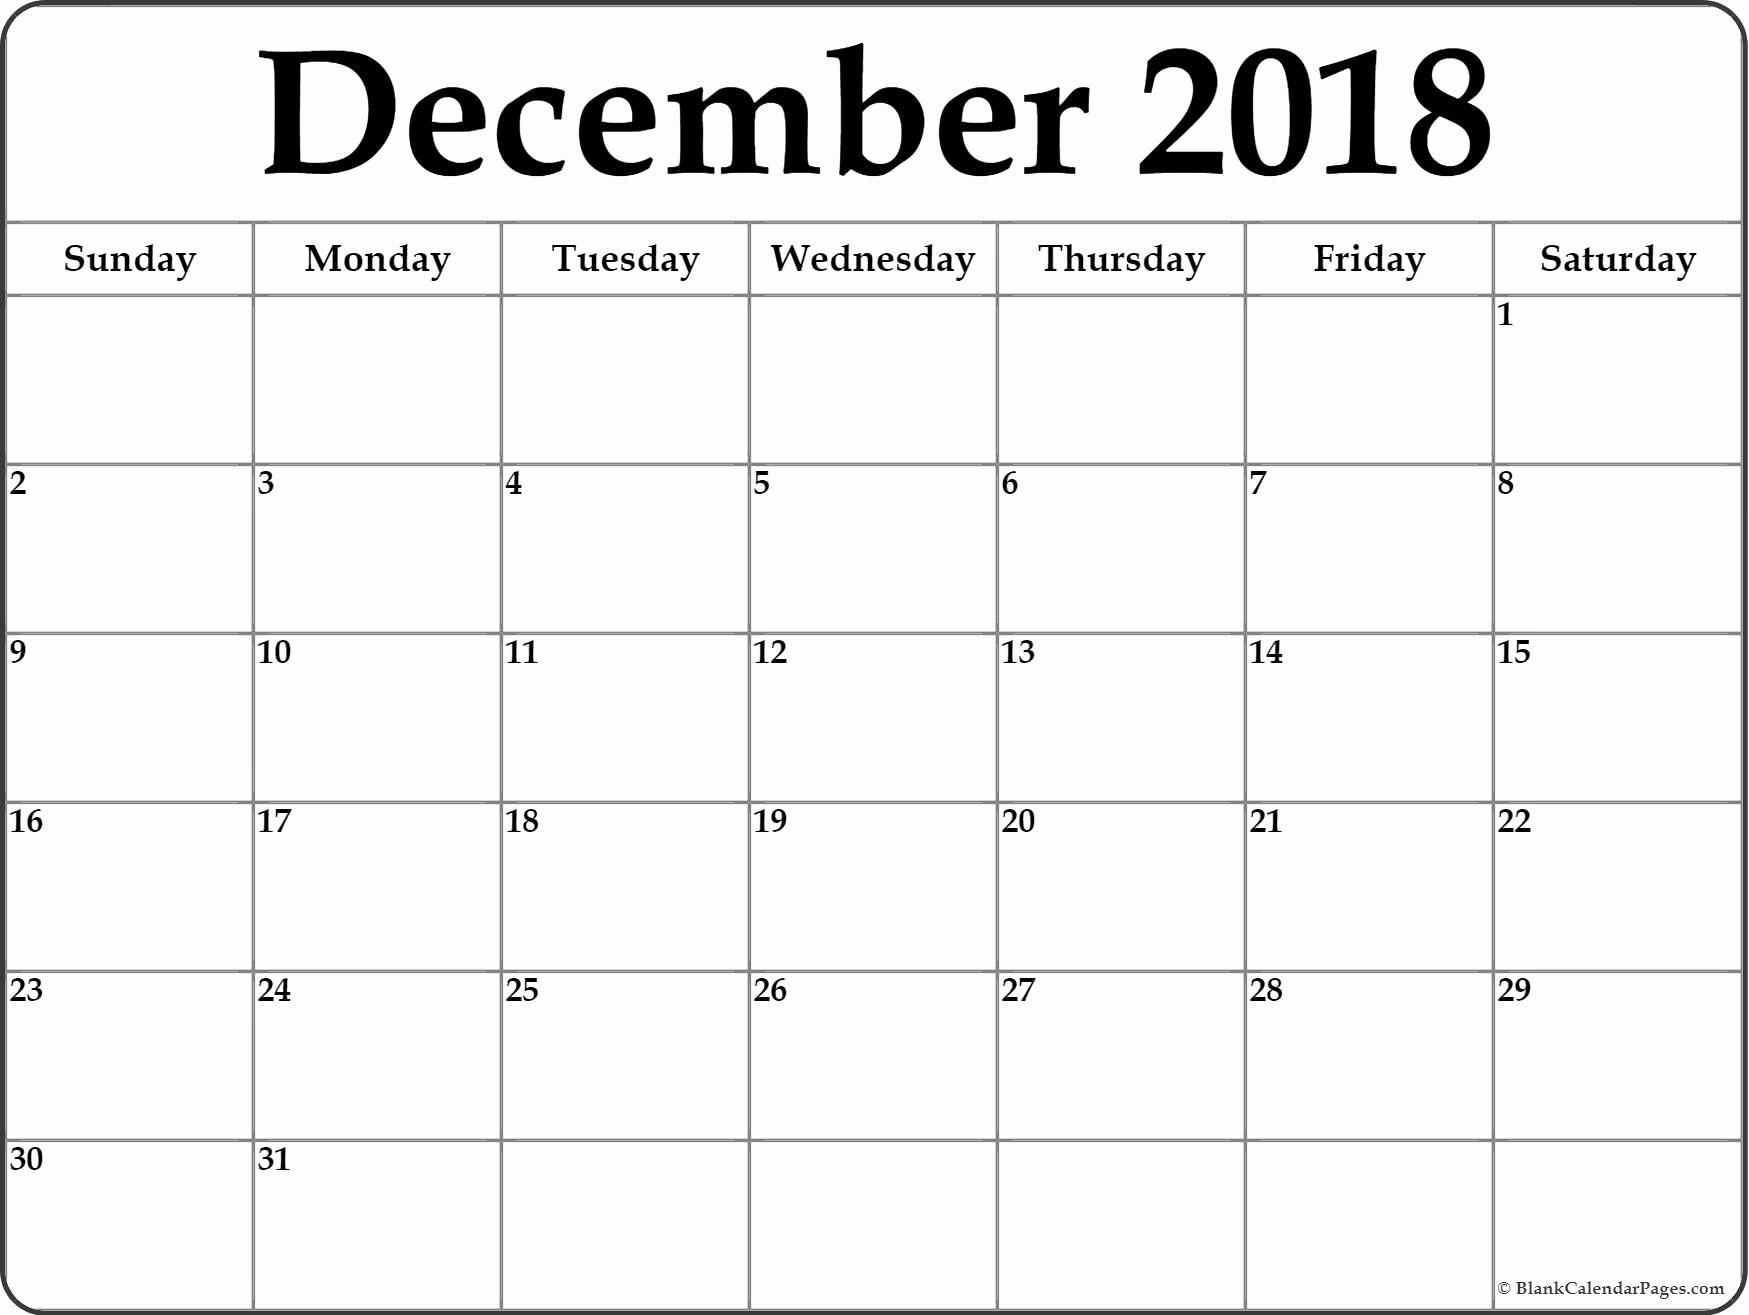 Calendar December 2018 And January 2019 | 2018 December